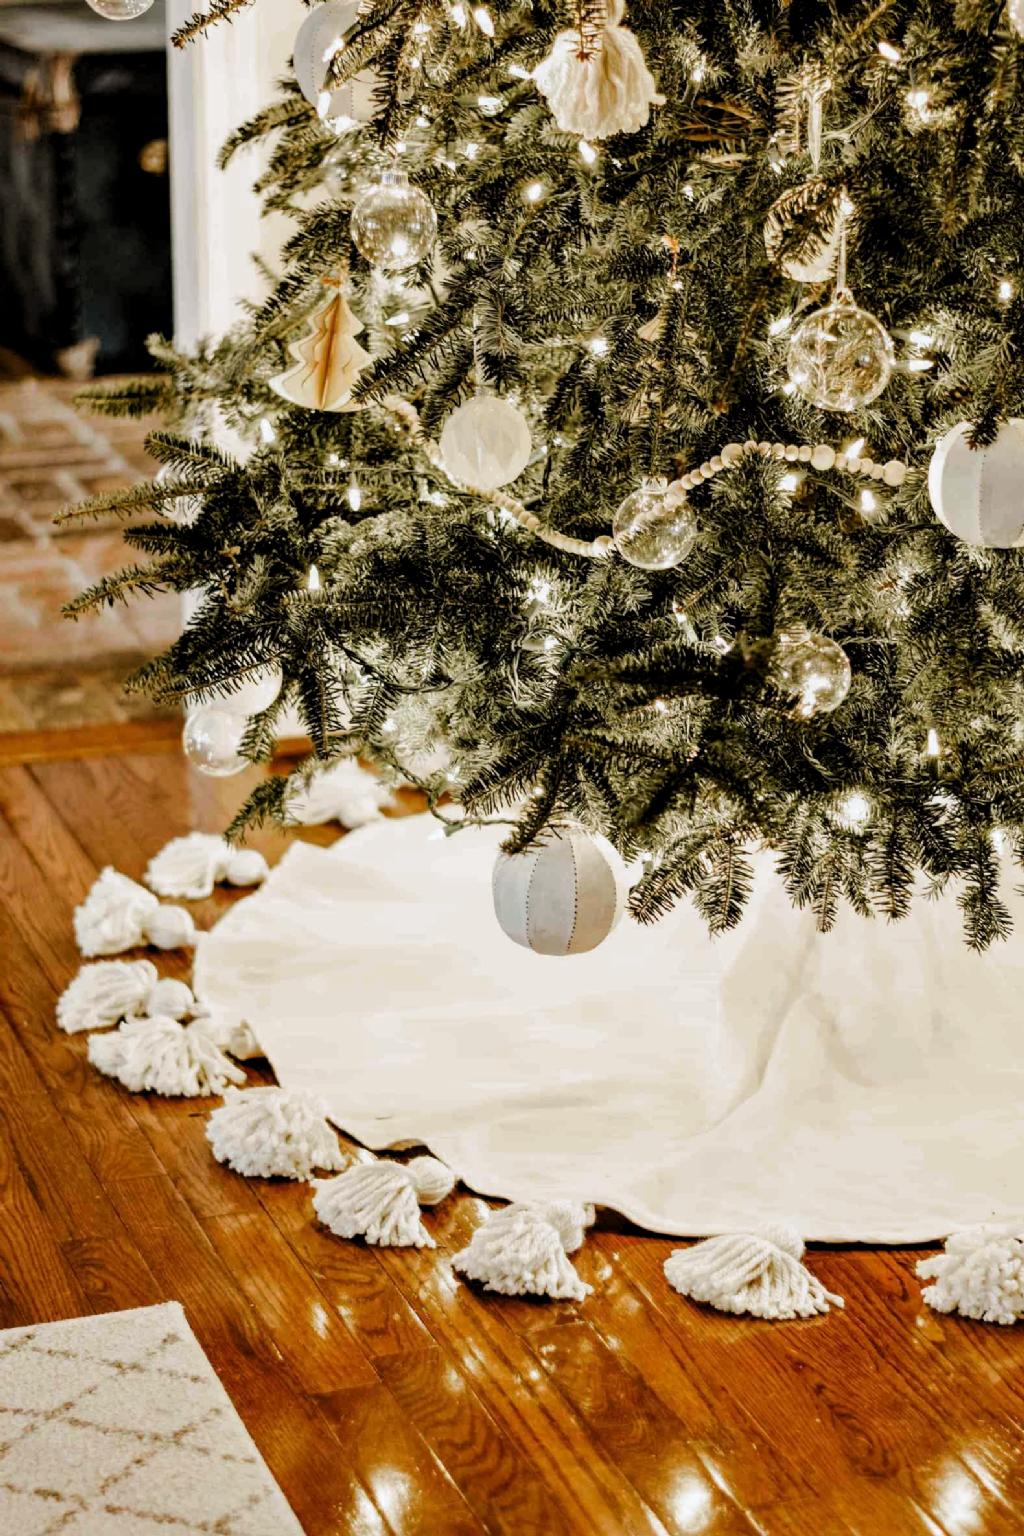 Diy Tasseled Tree Skirt For A Simple Christmas Tree House On Longwood Lane In 2020 Simple Christmas Tree Simple Christmas Diy Tassel